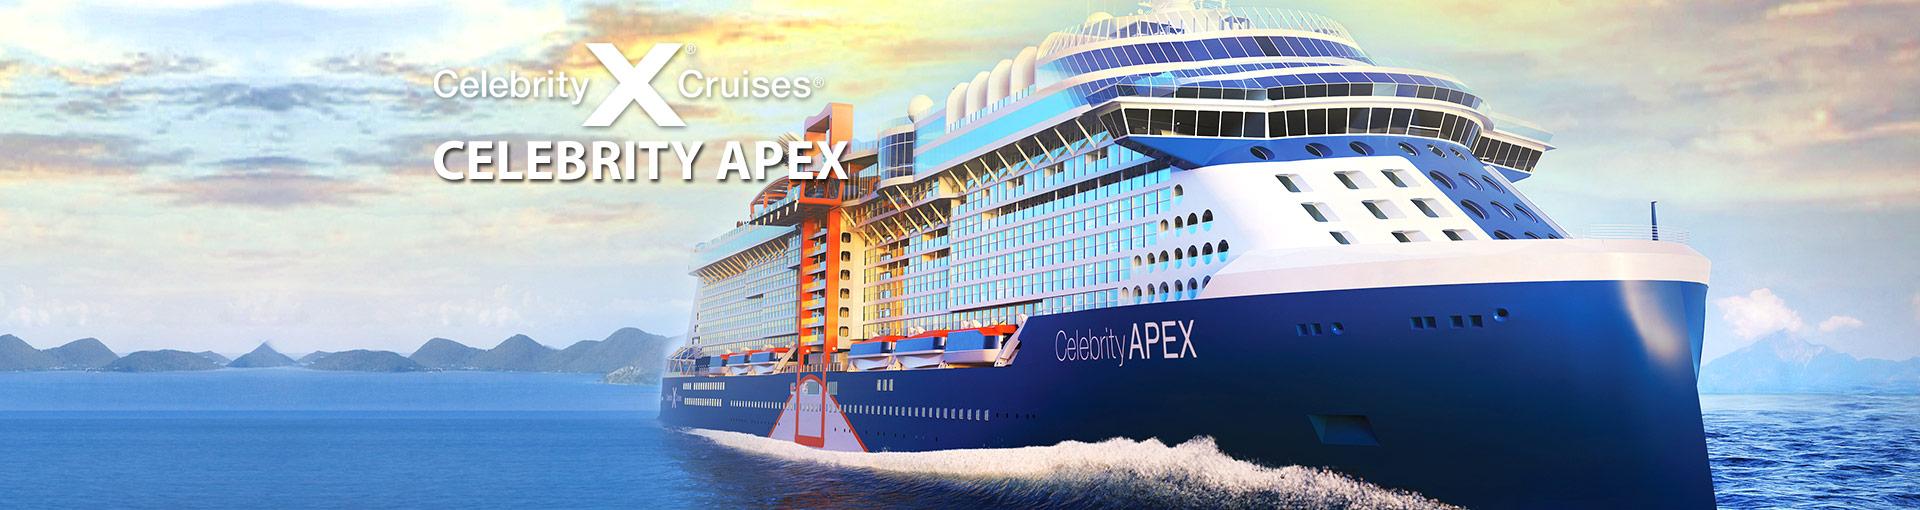 Celebrity Cruises Celebrity Apex Cruise Ship, 2020 and 2021